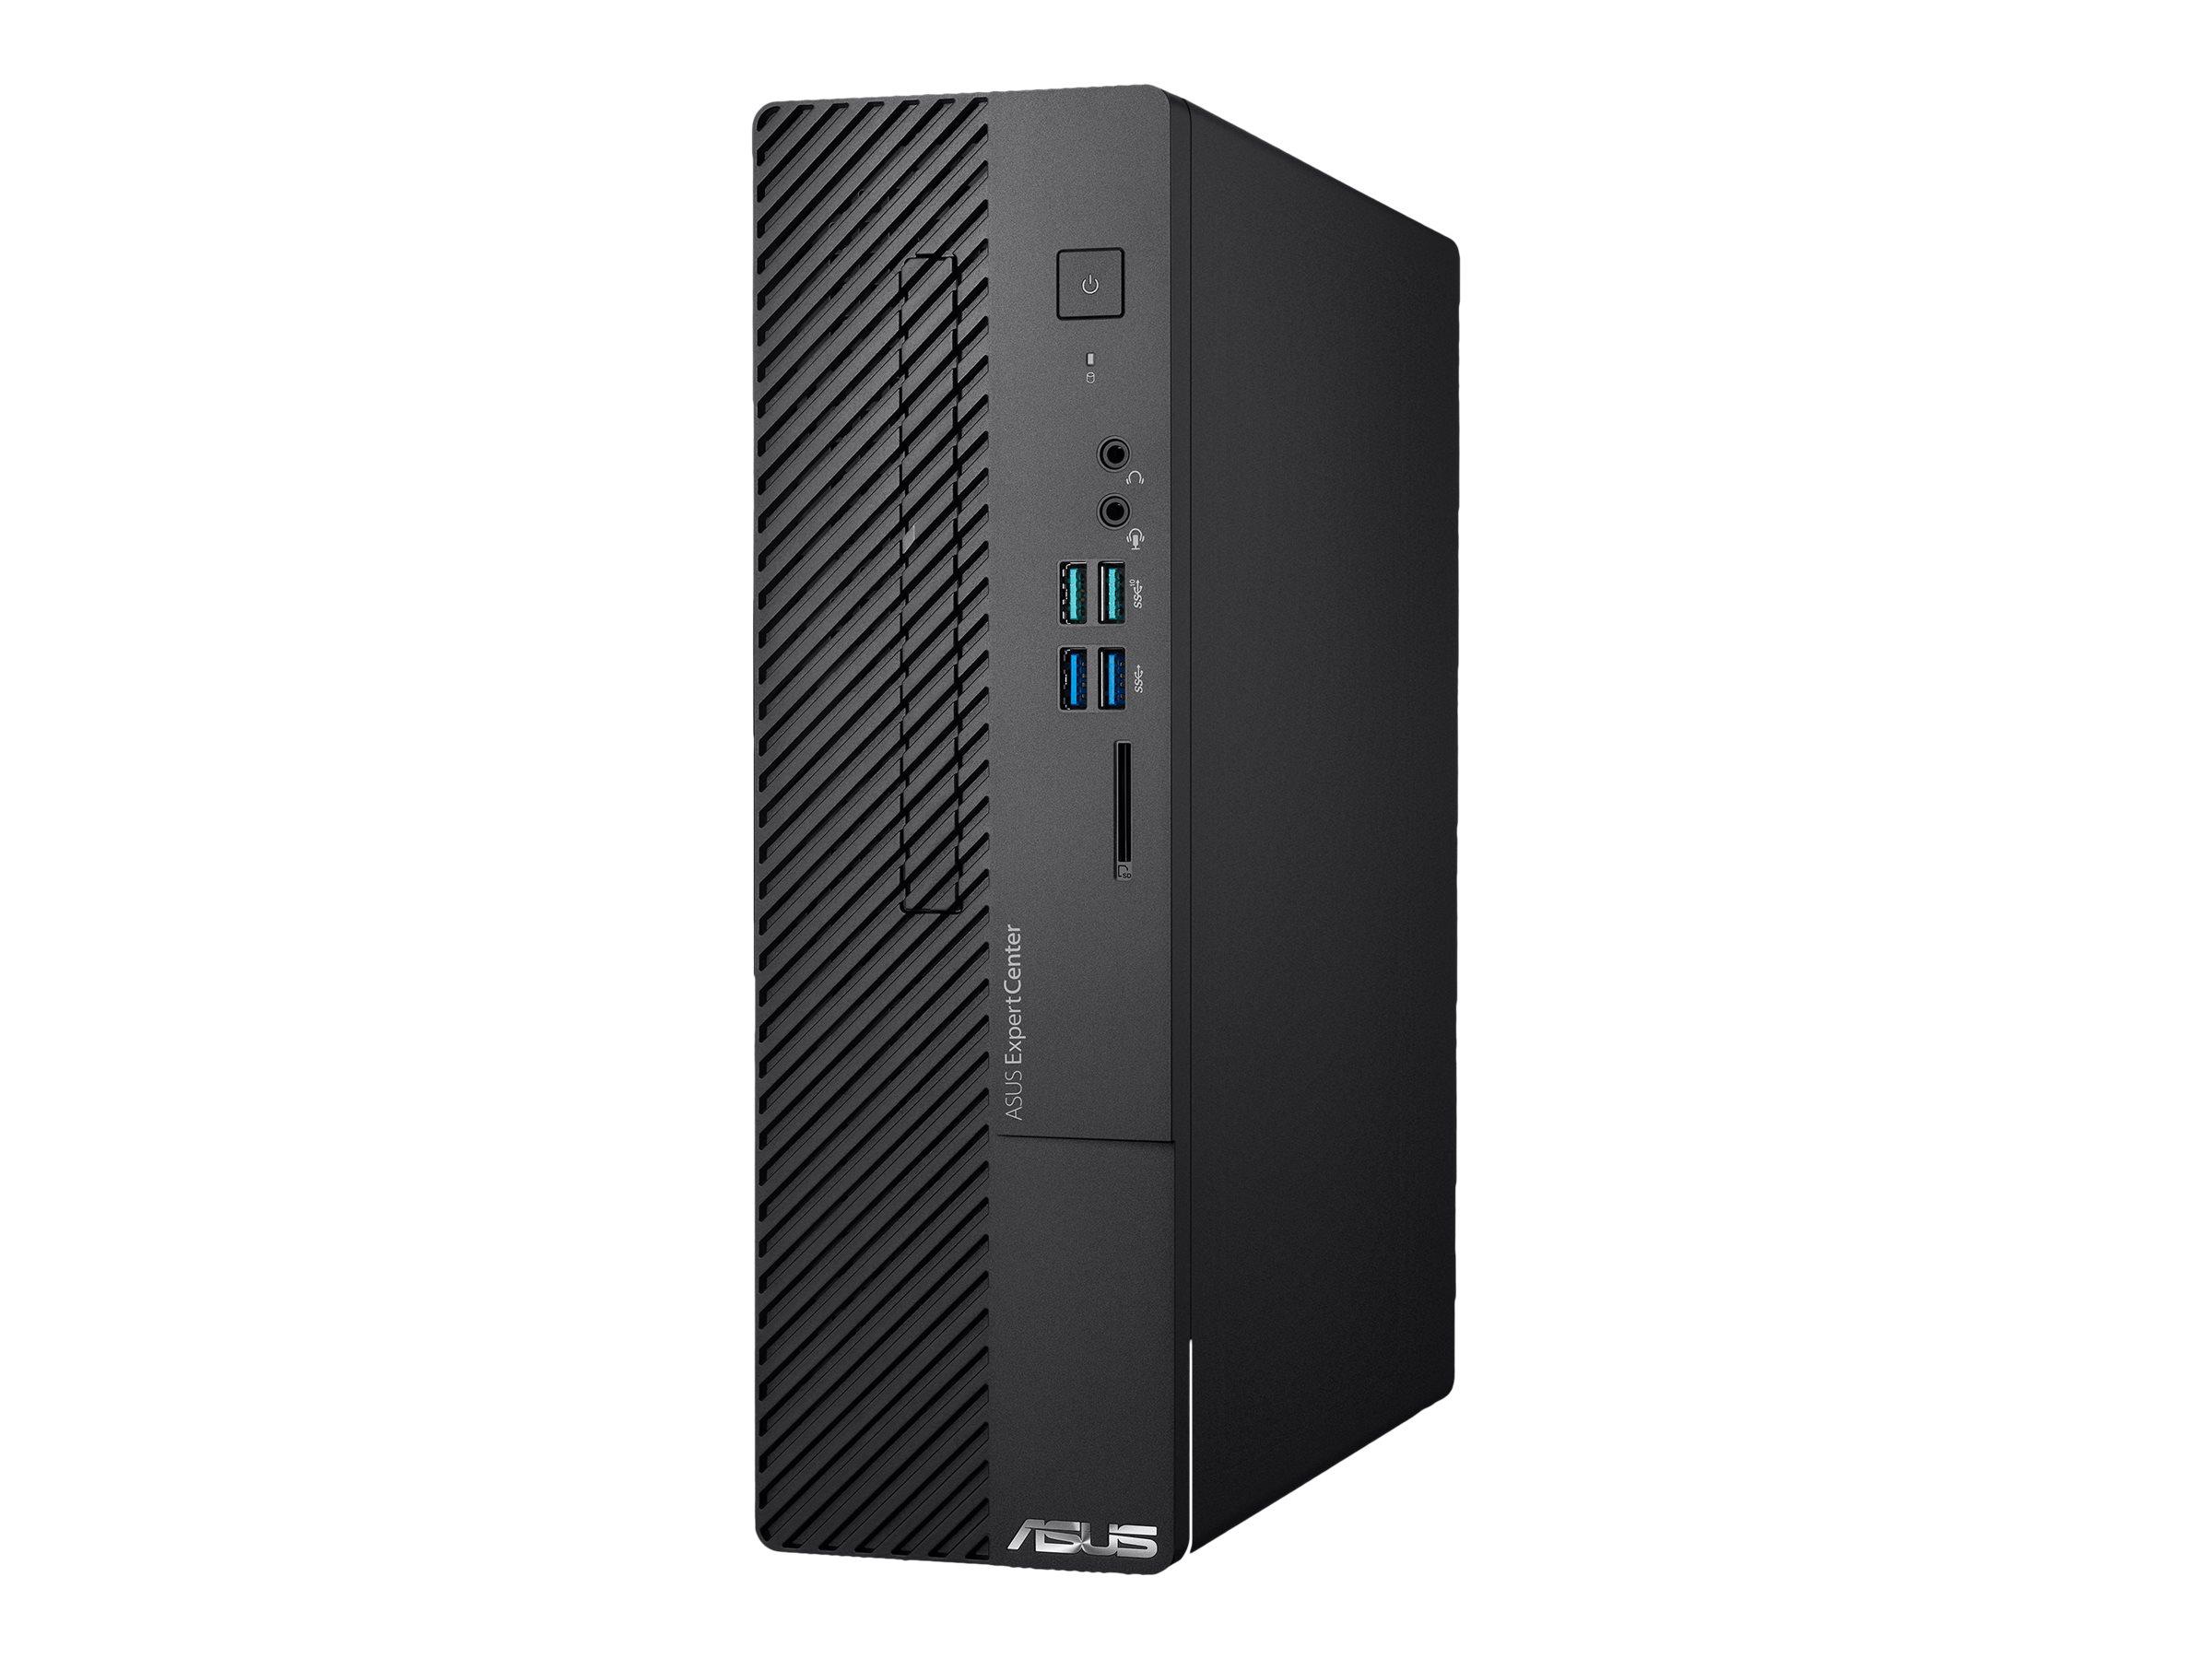 ASUS ExpertCenter D5 SFF D500SC 511400035R - SFF